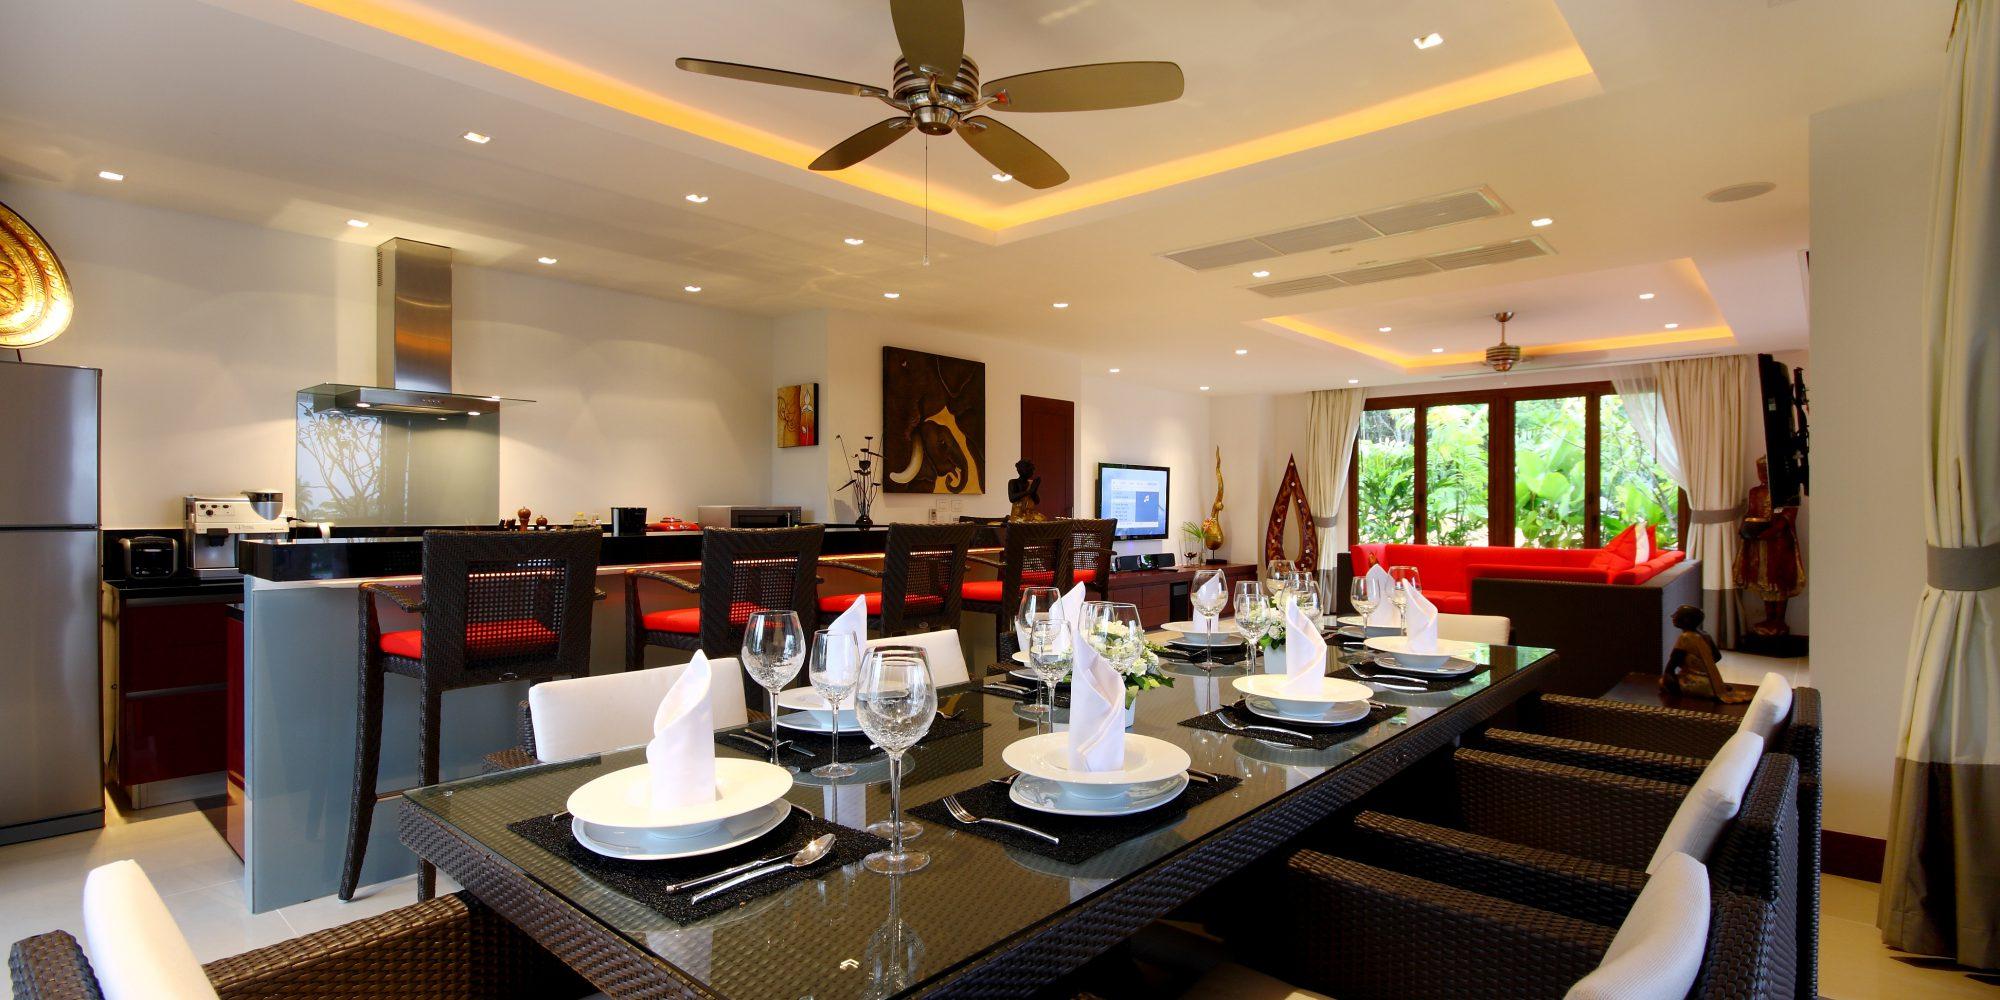 Koh yao villa thailand skyline design for 10 x 17 living room